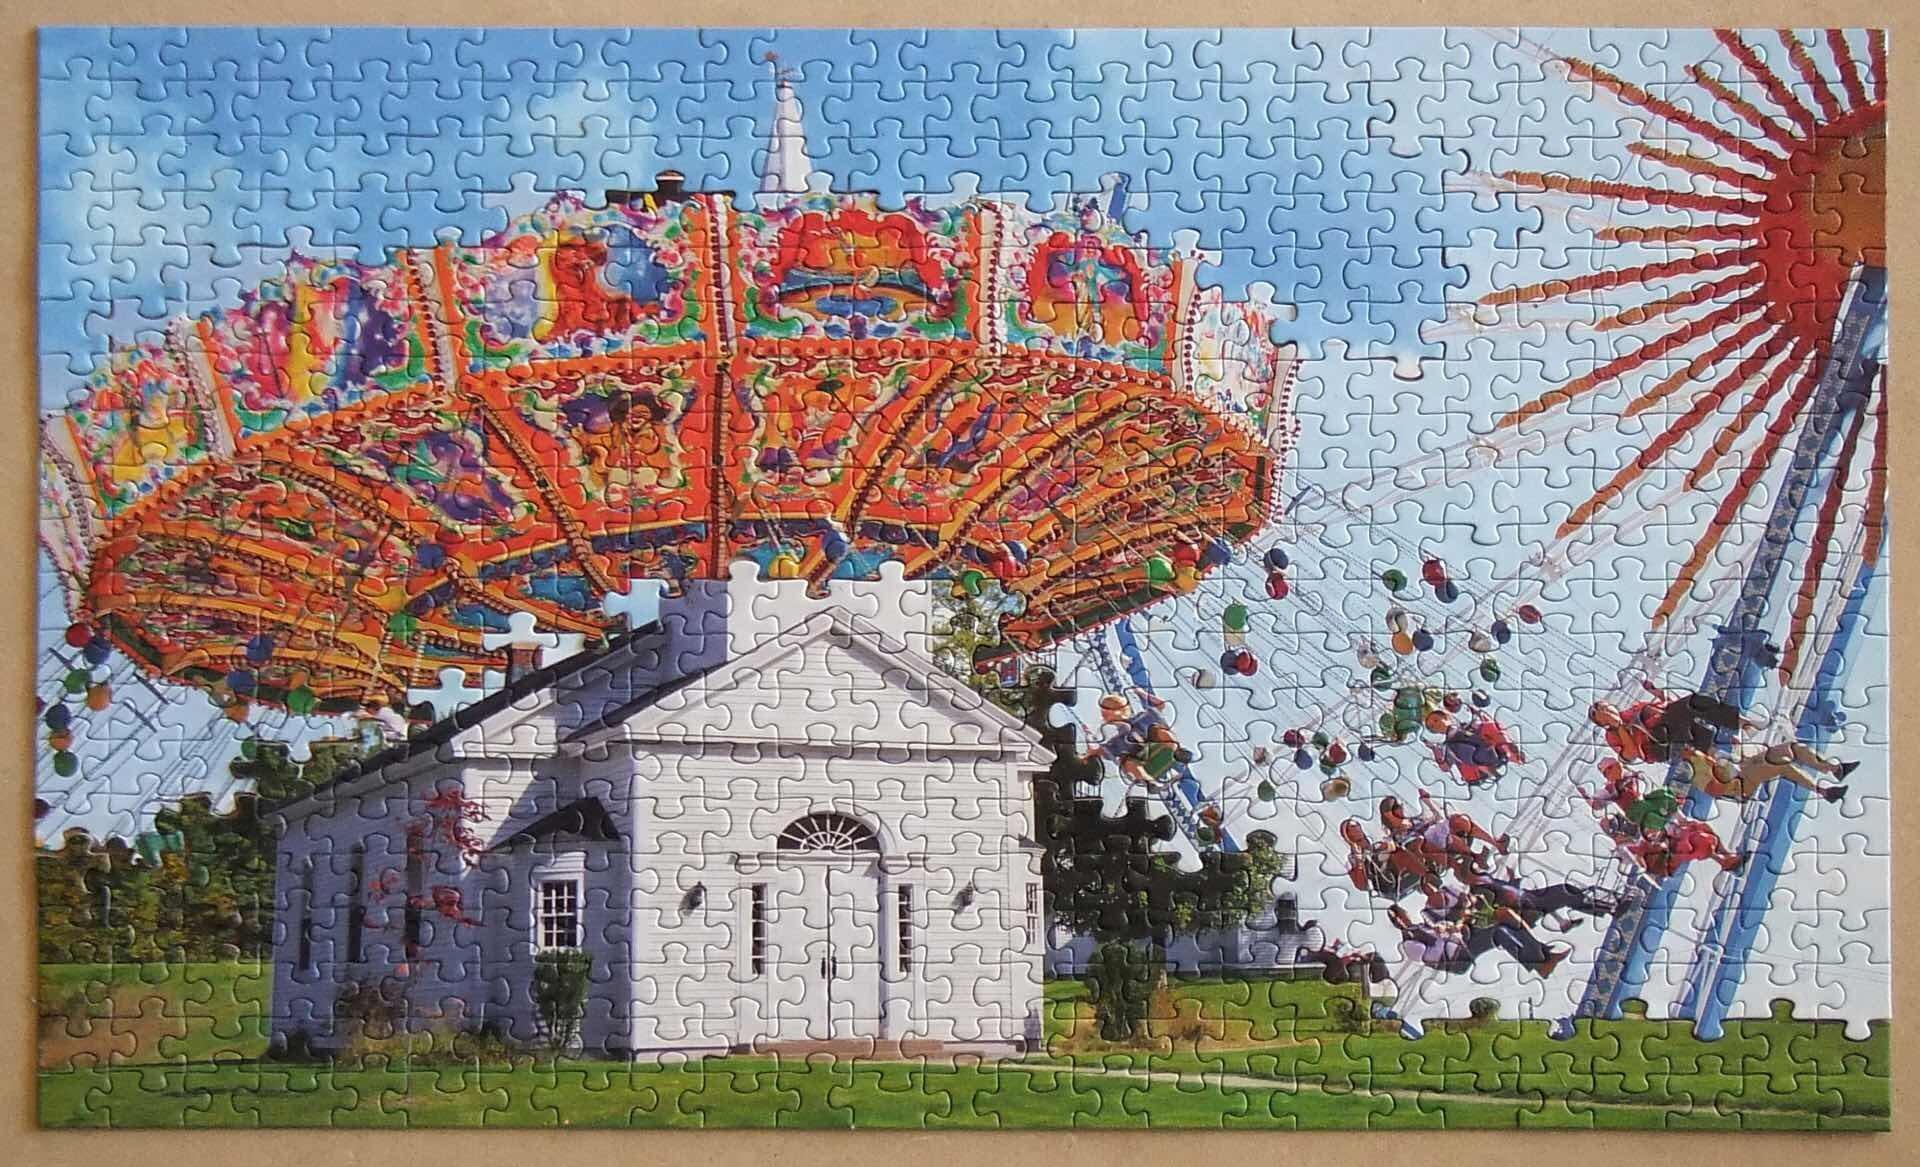 Puzzle montage by Tim Klein